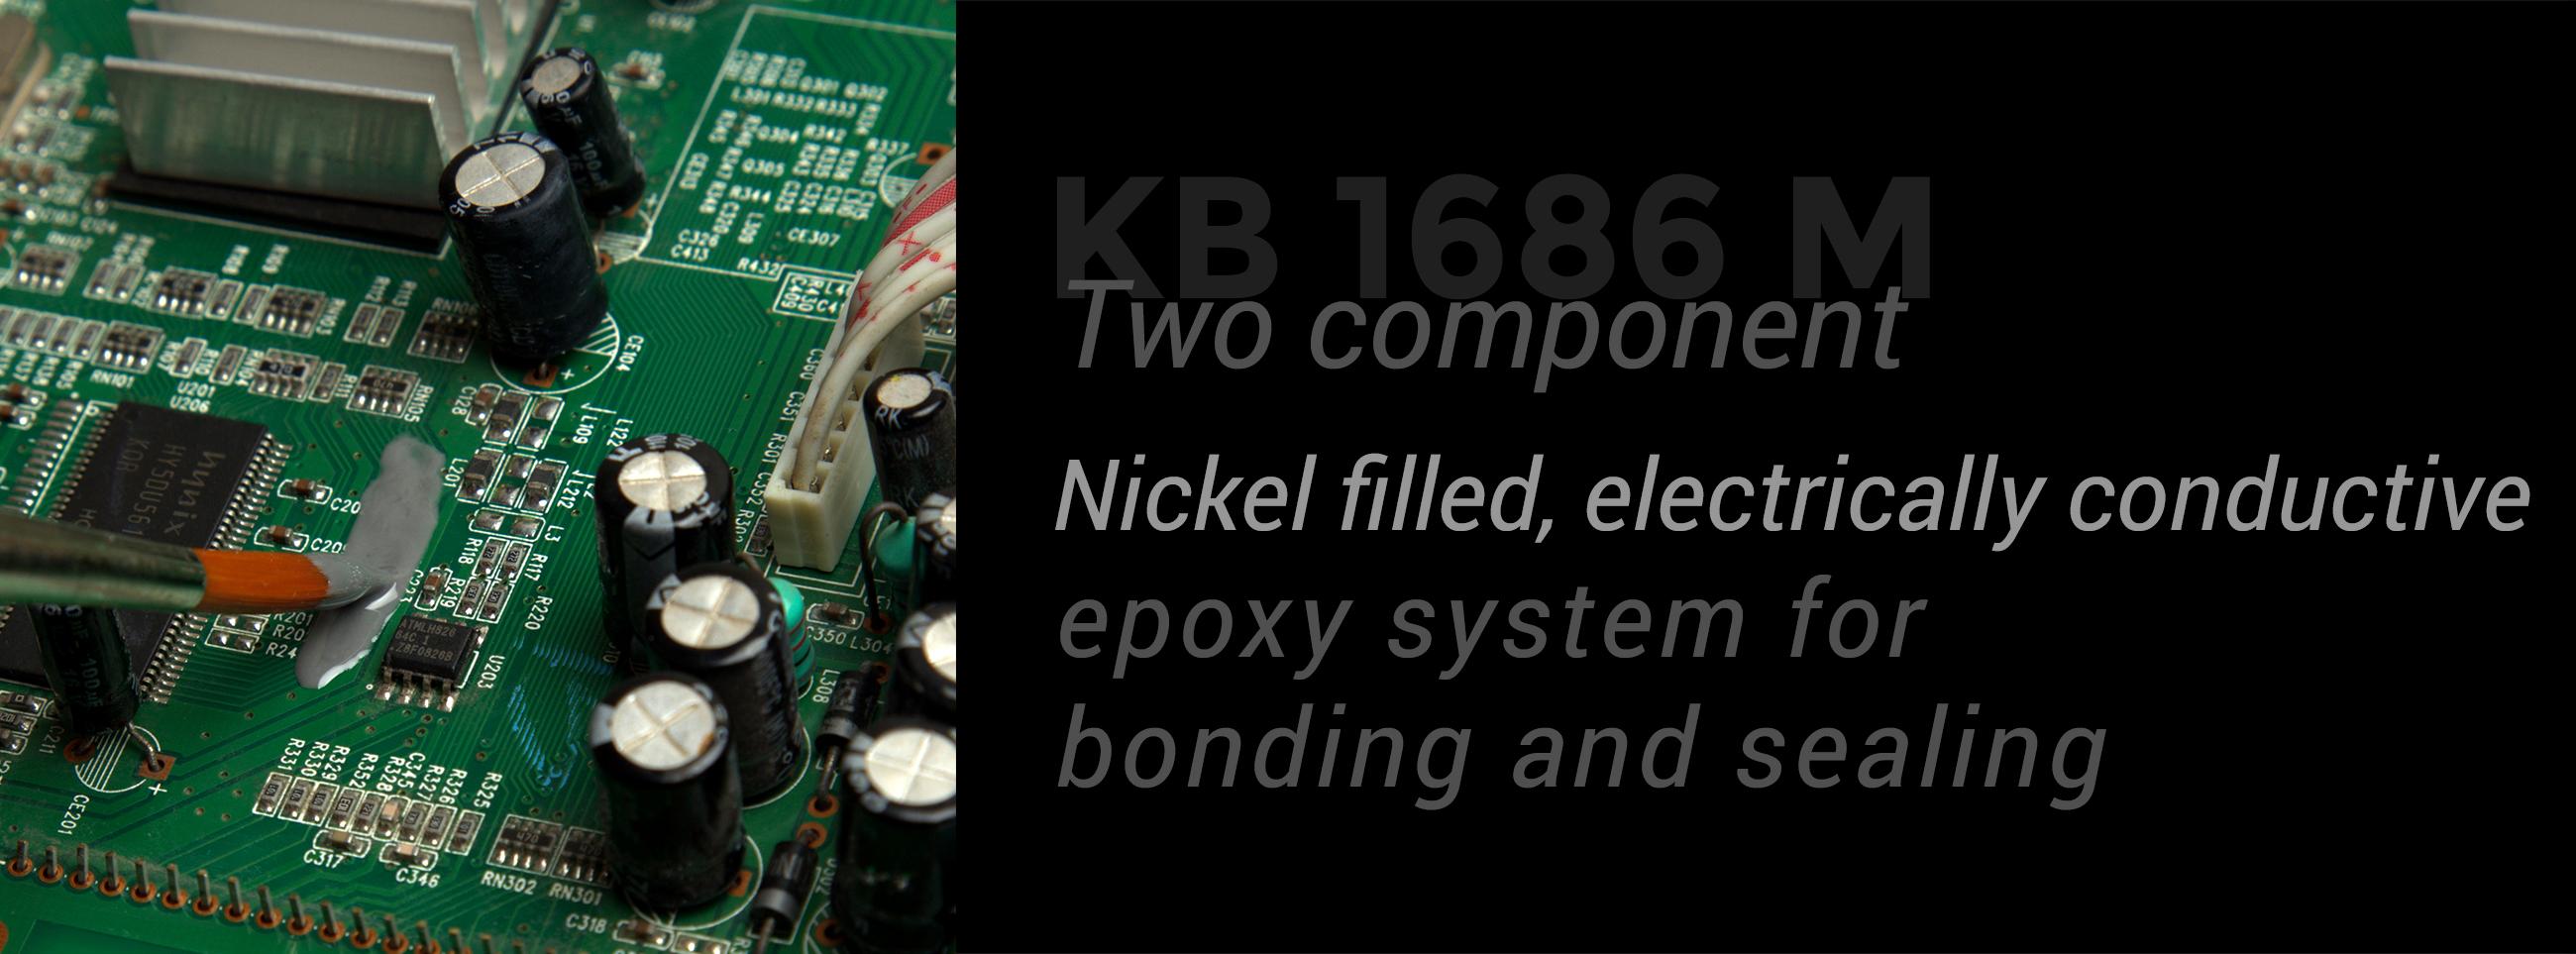 KB 1686 M